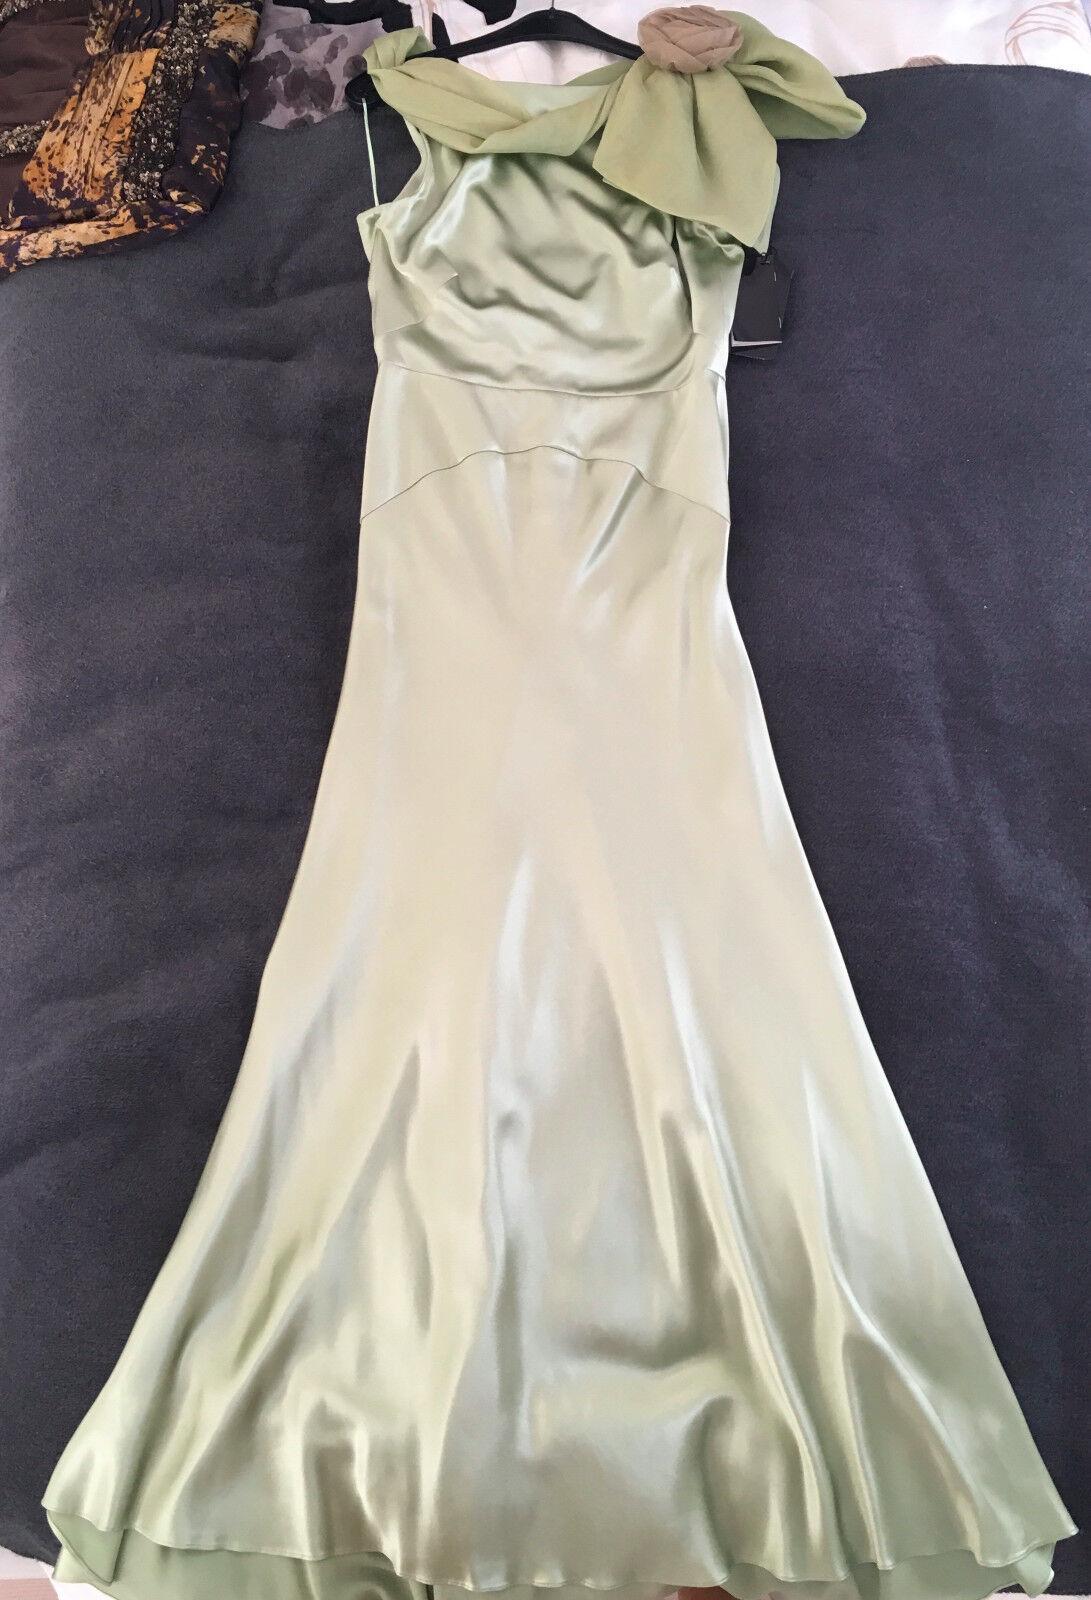 ESCADA  evening   ball gown - green silk - NWT - sz 38